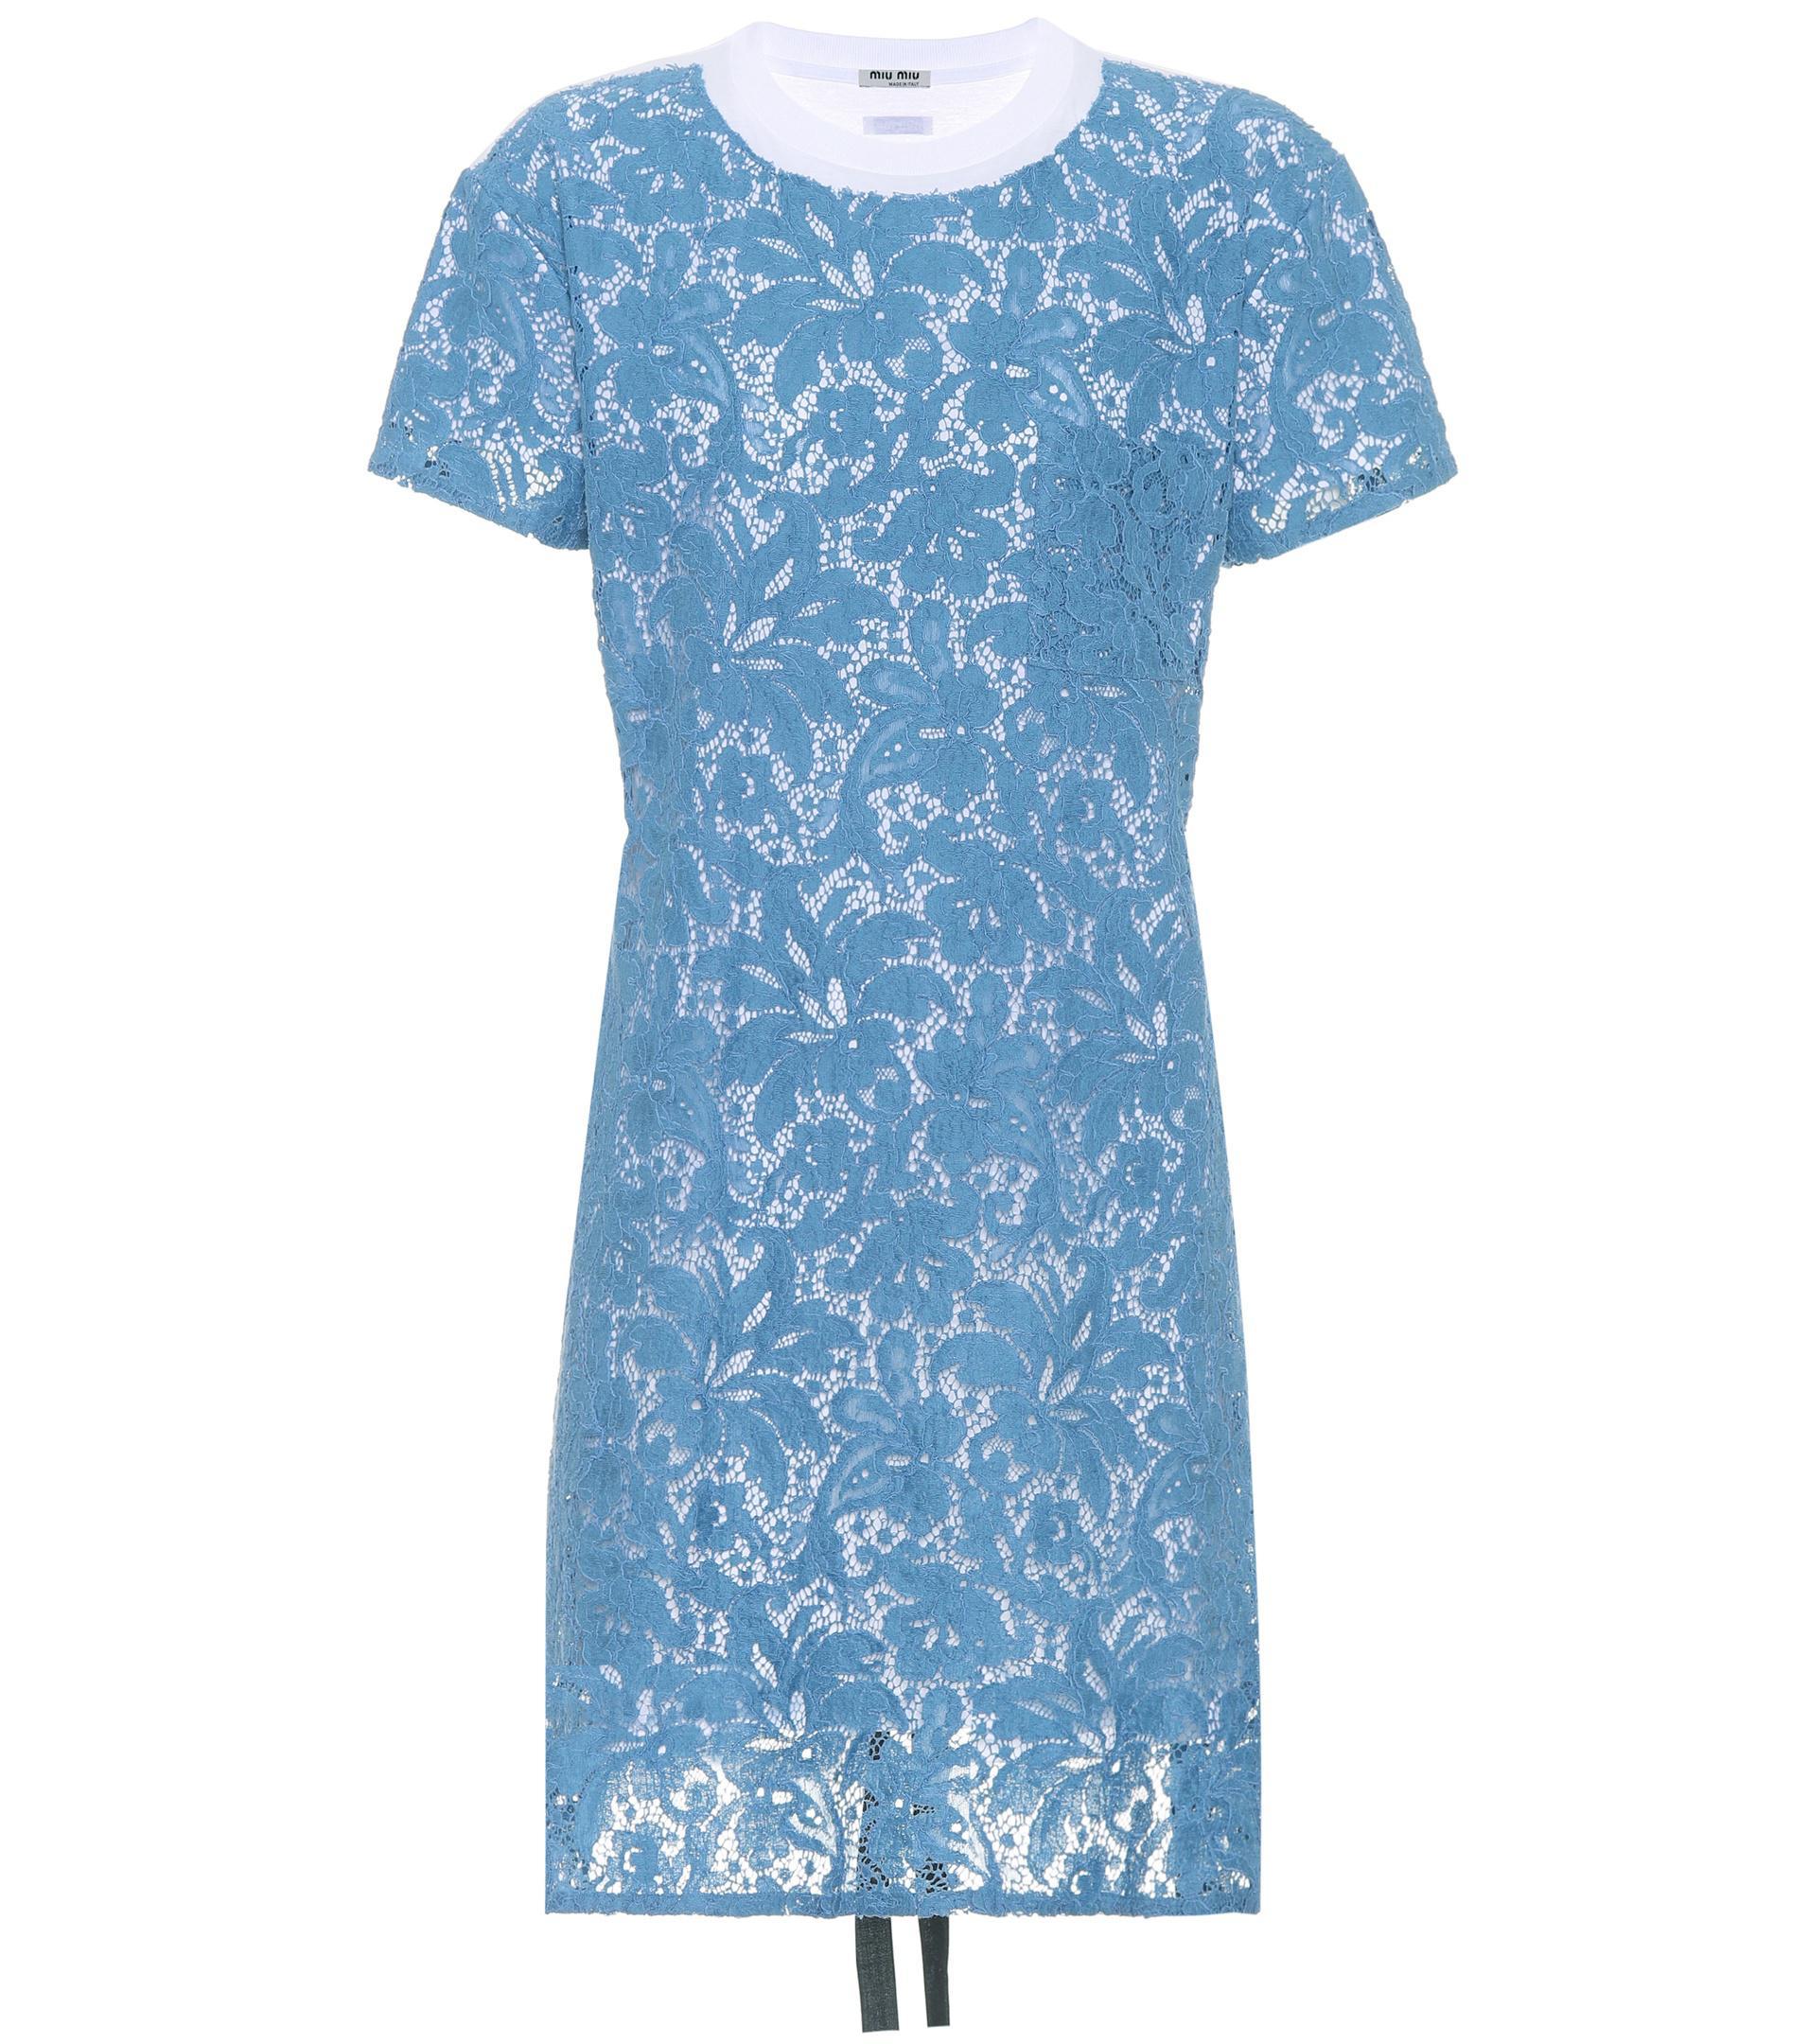 Lyst miu miu cotton lace t shirt dress in blue for Miu miu t shirt